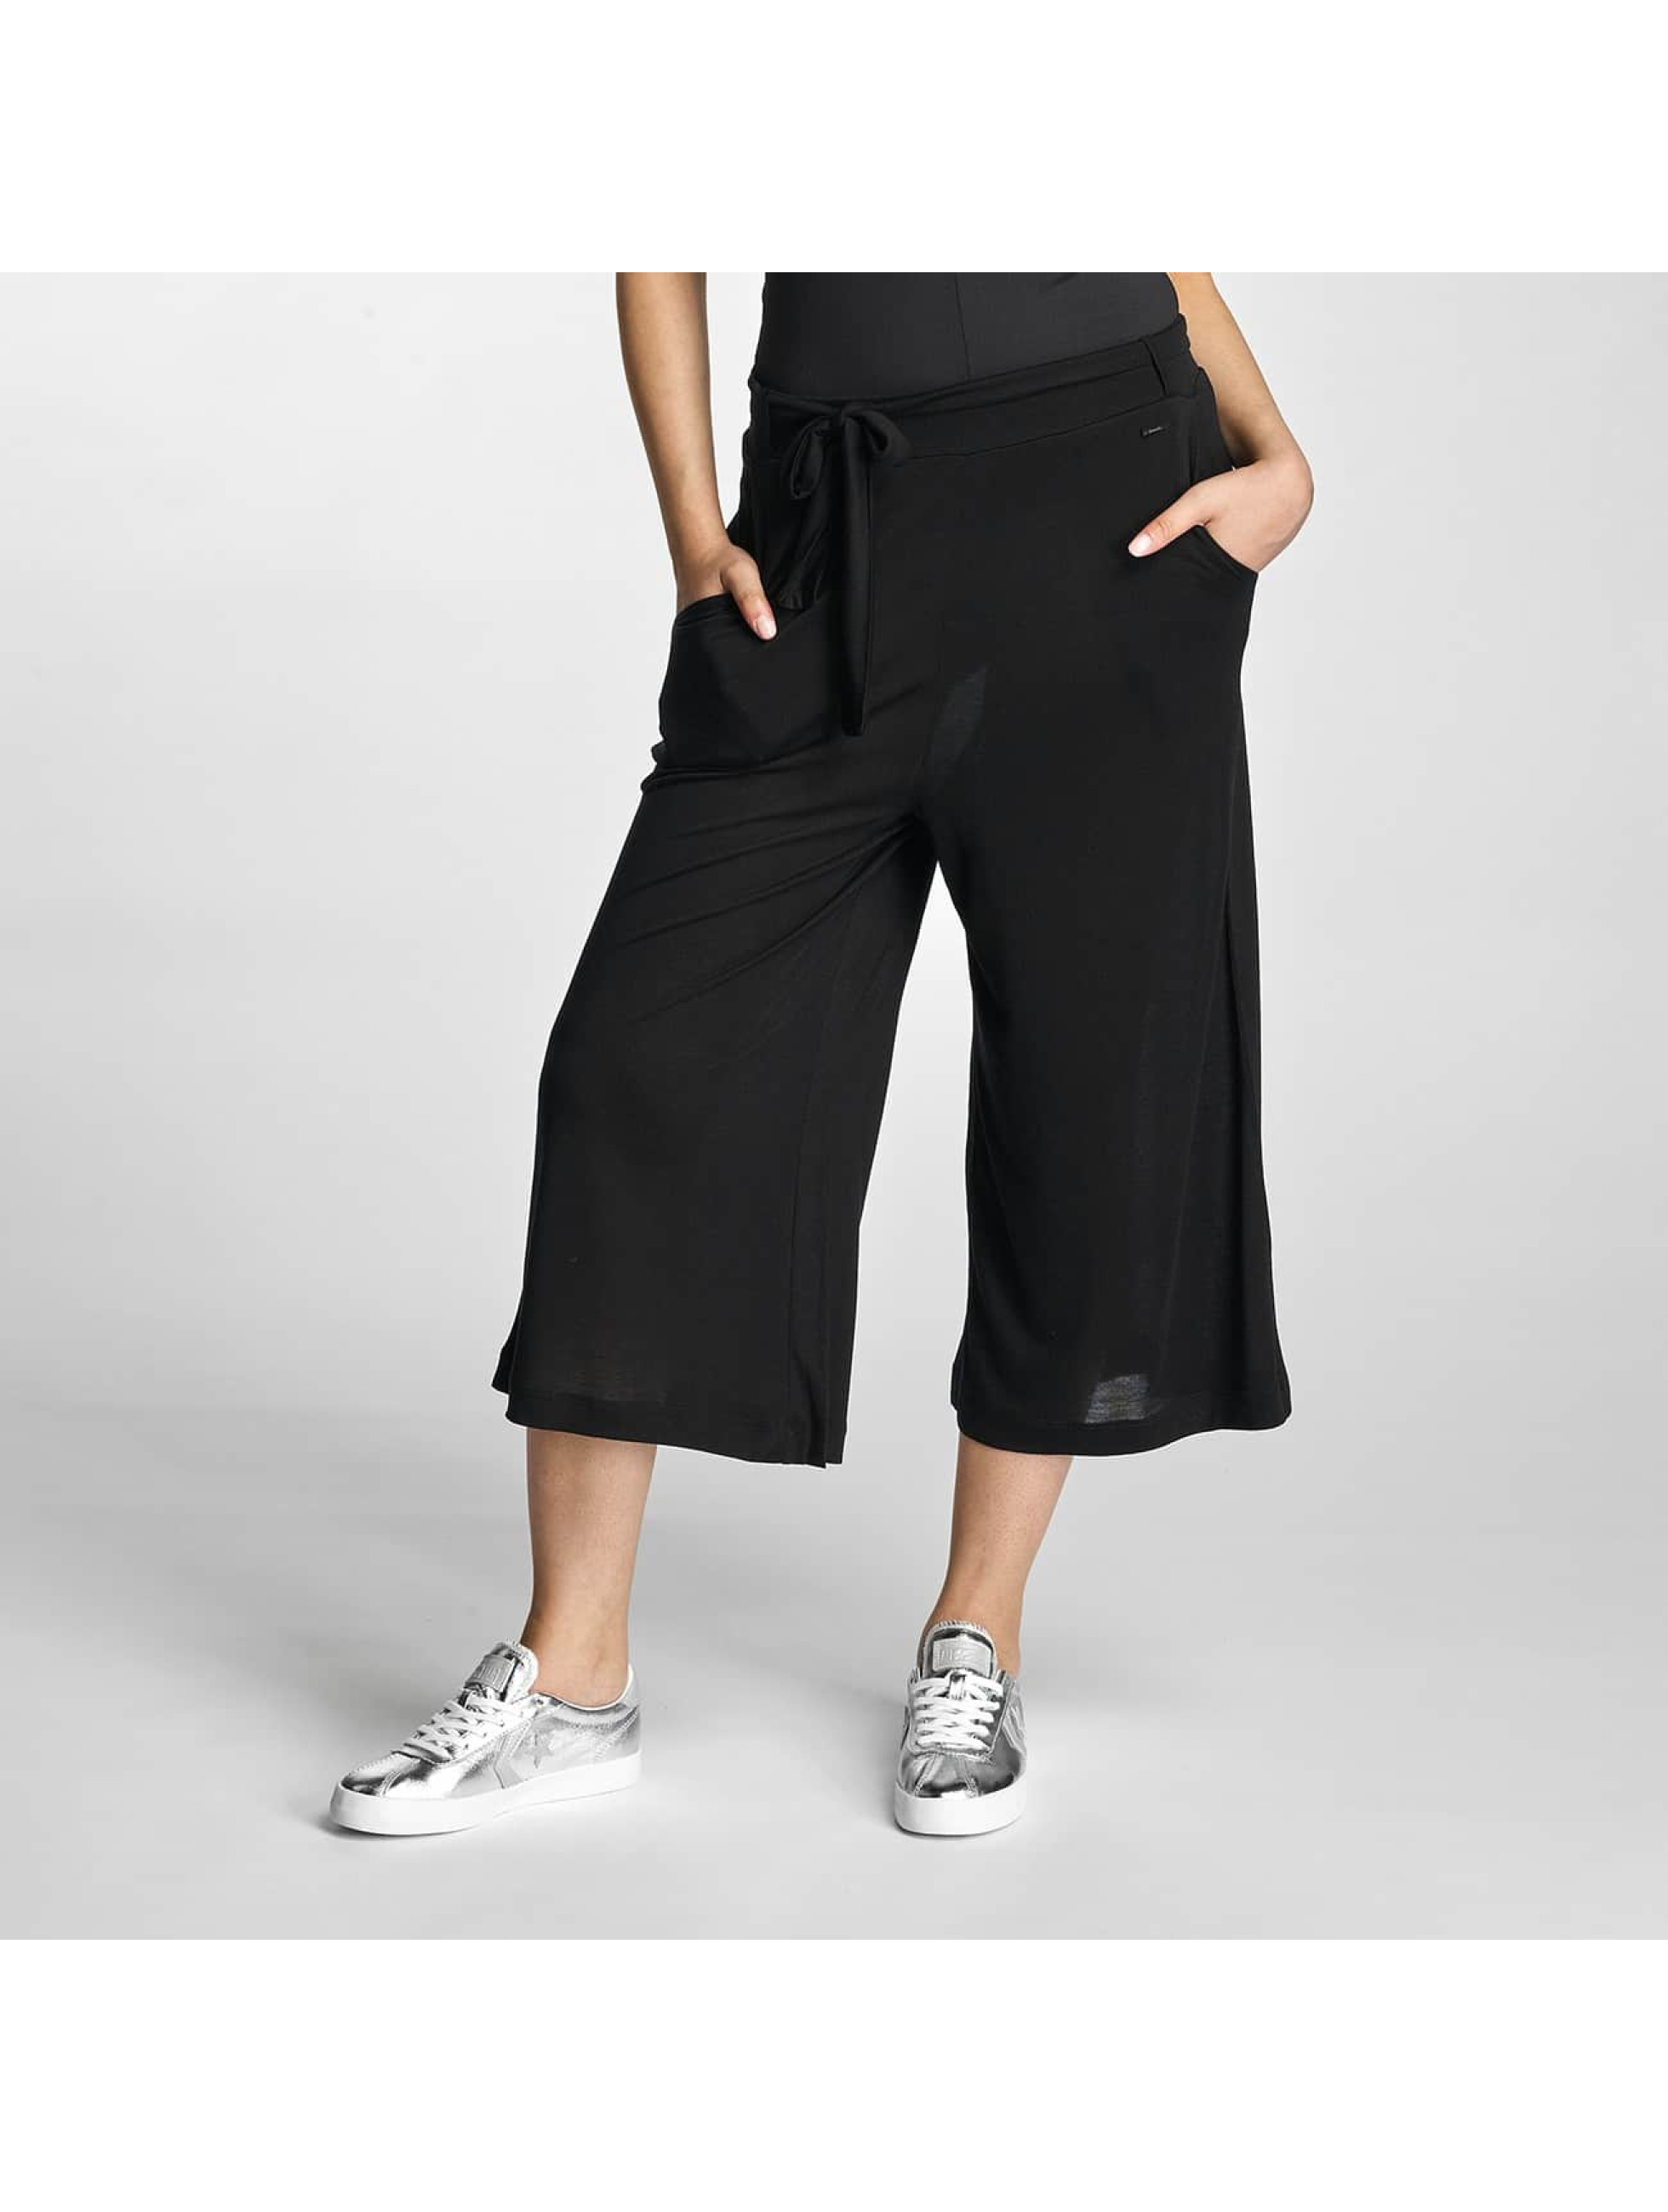 bench damen chino jersey skirt in schwarz 310394. Black Bedroom Furniture Sets. Home Design Ideas